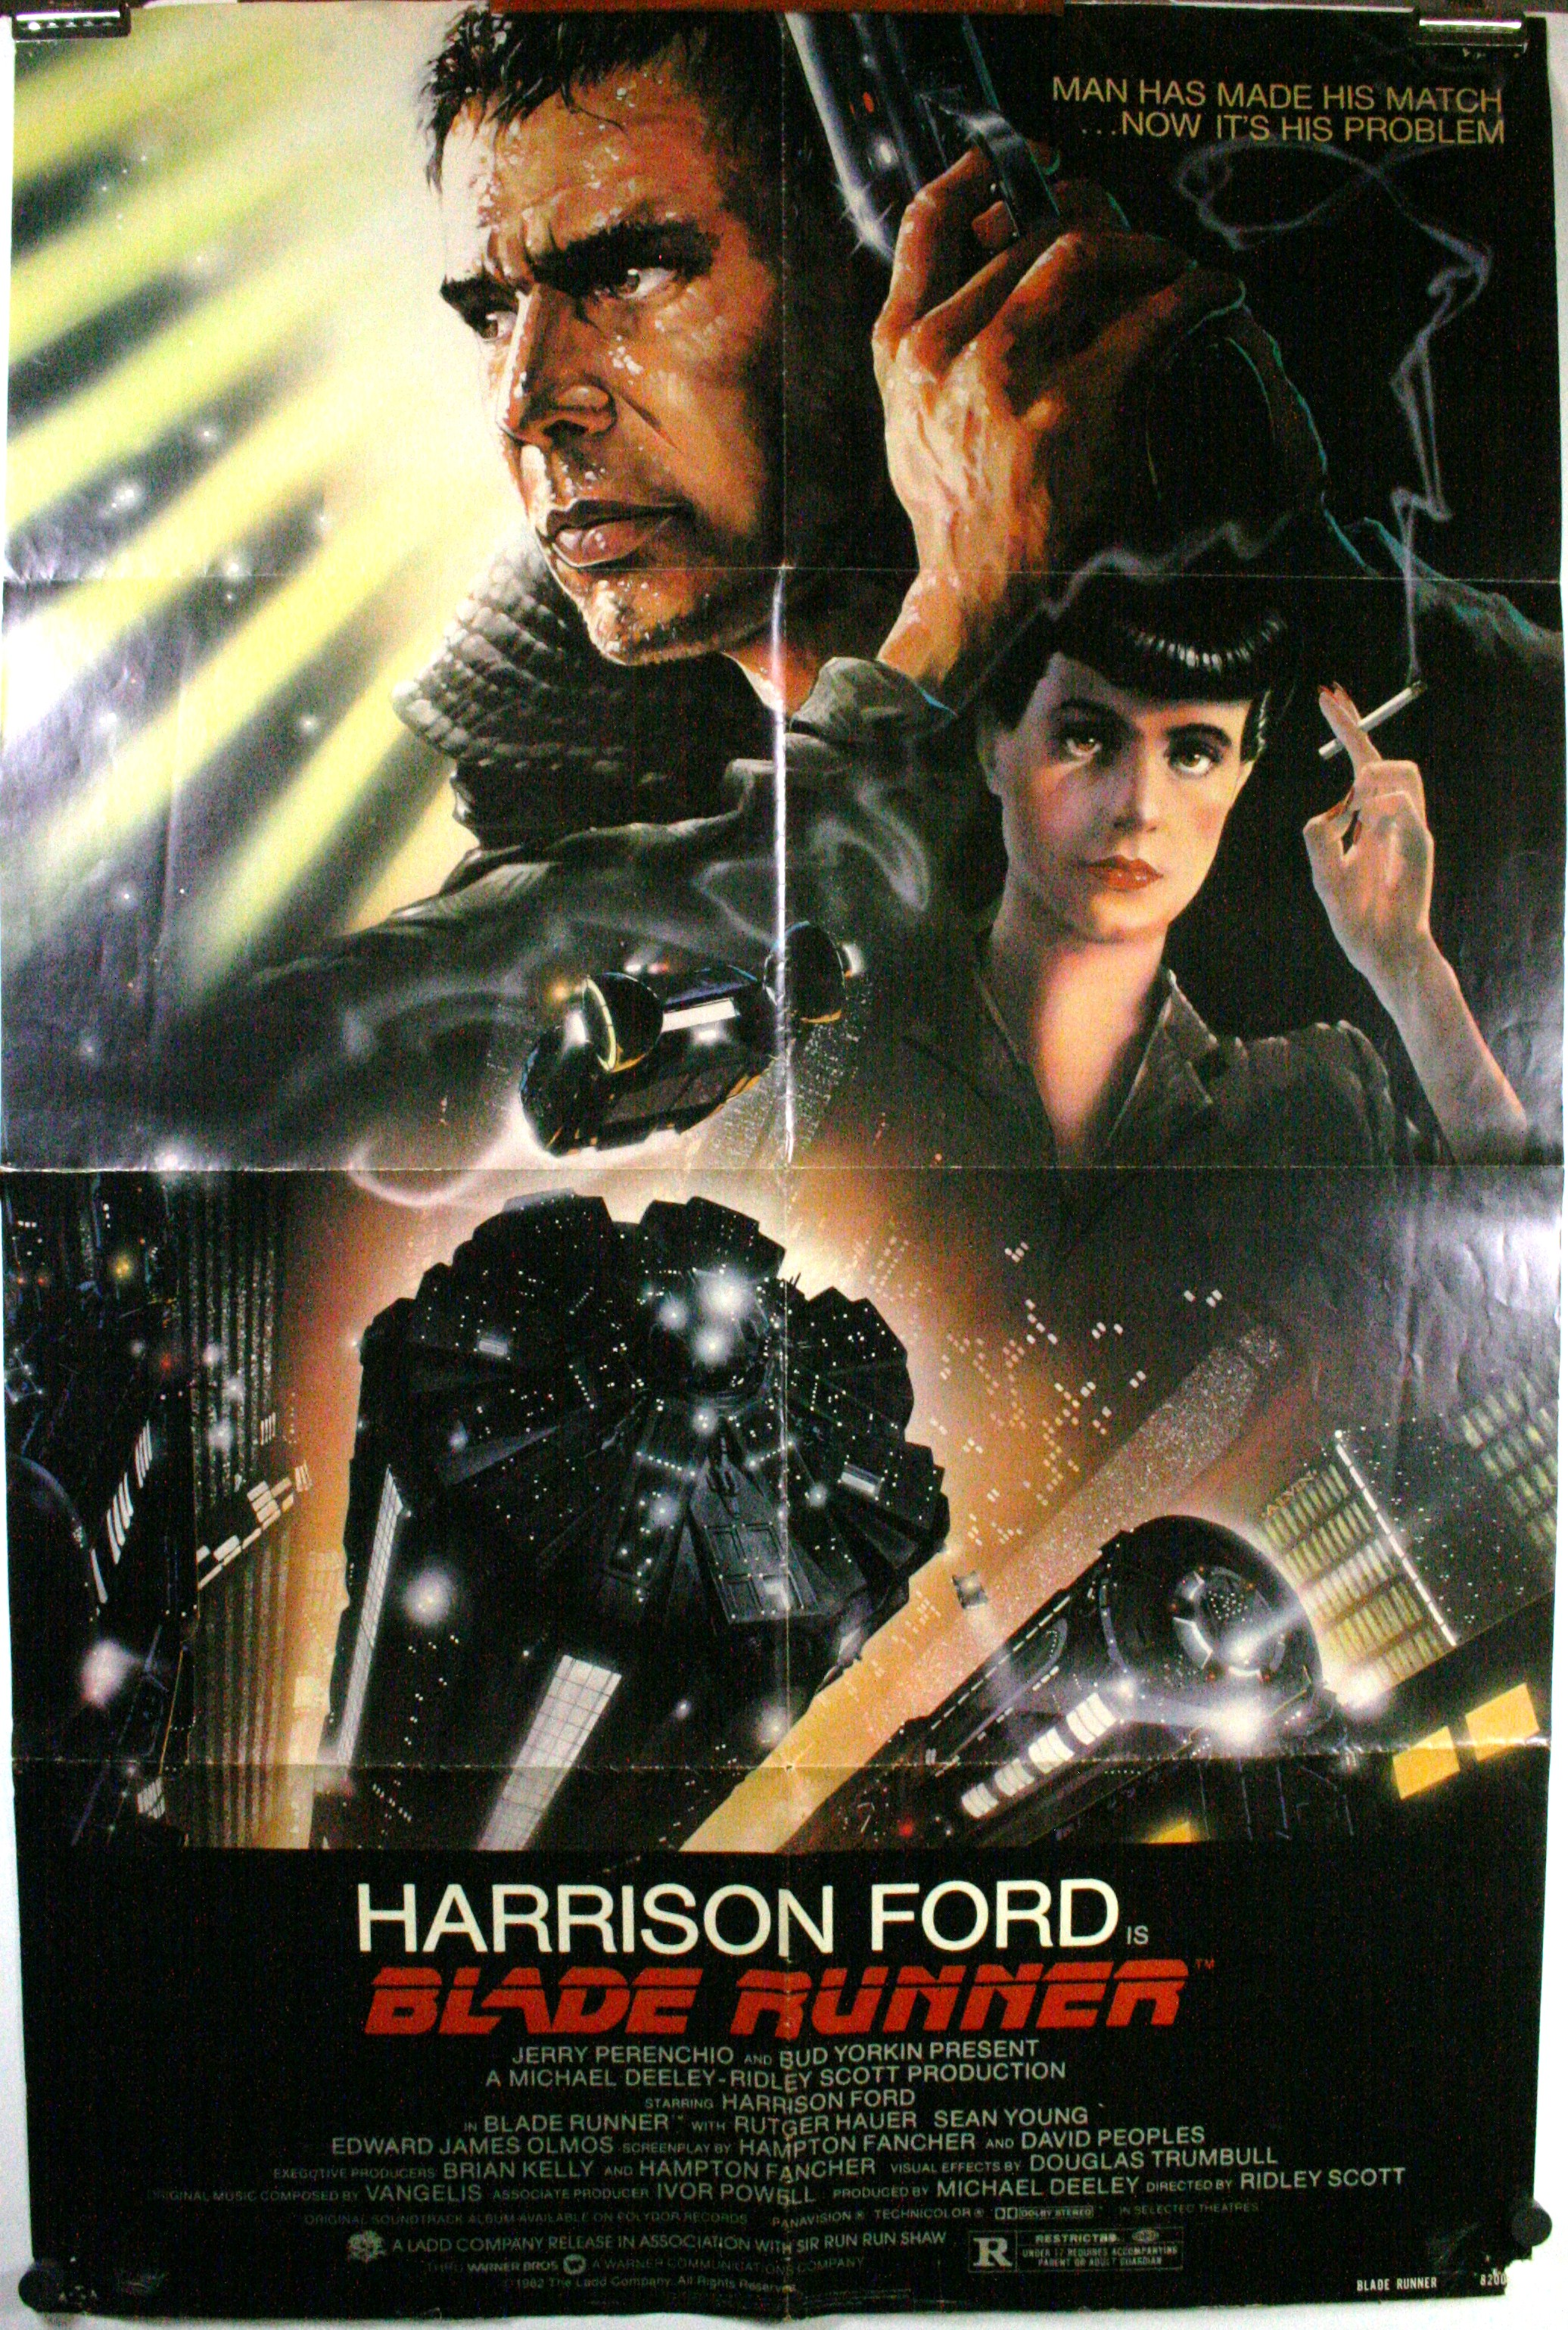 Blade Runner Harrison Ford Original Movie Poster